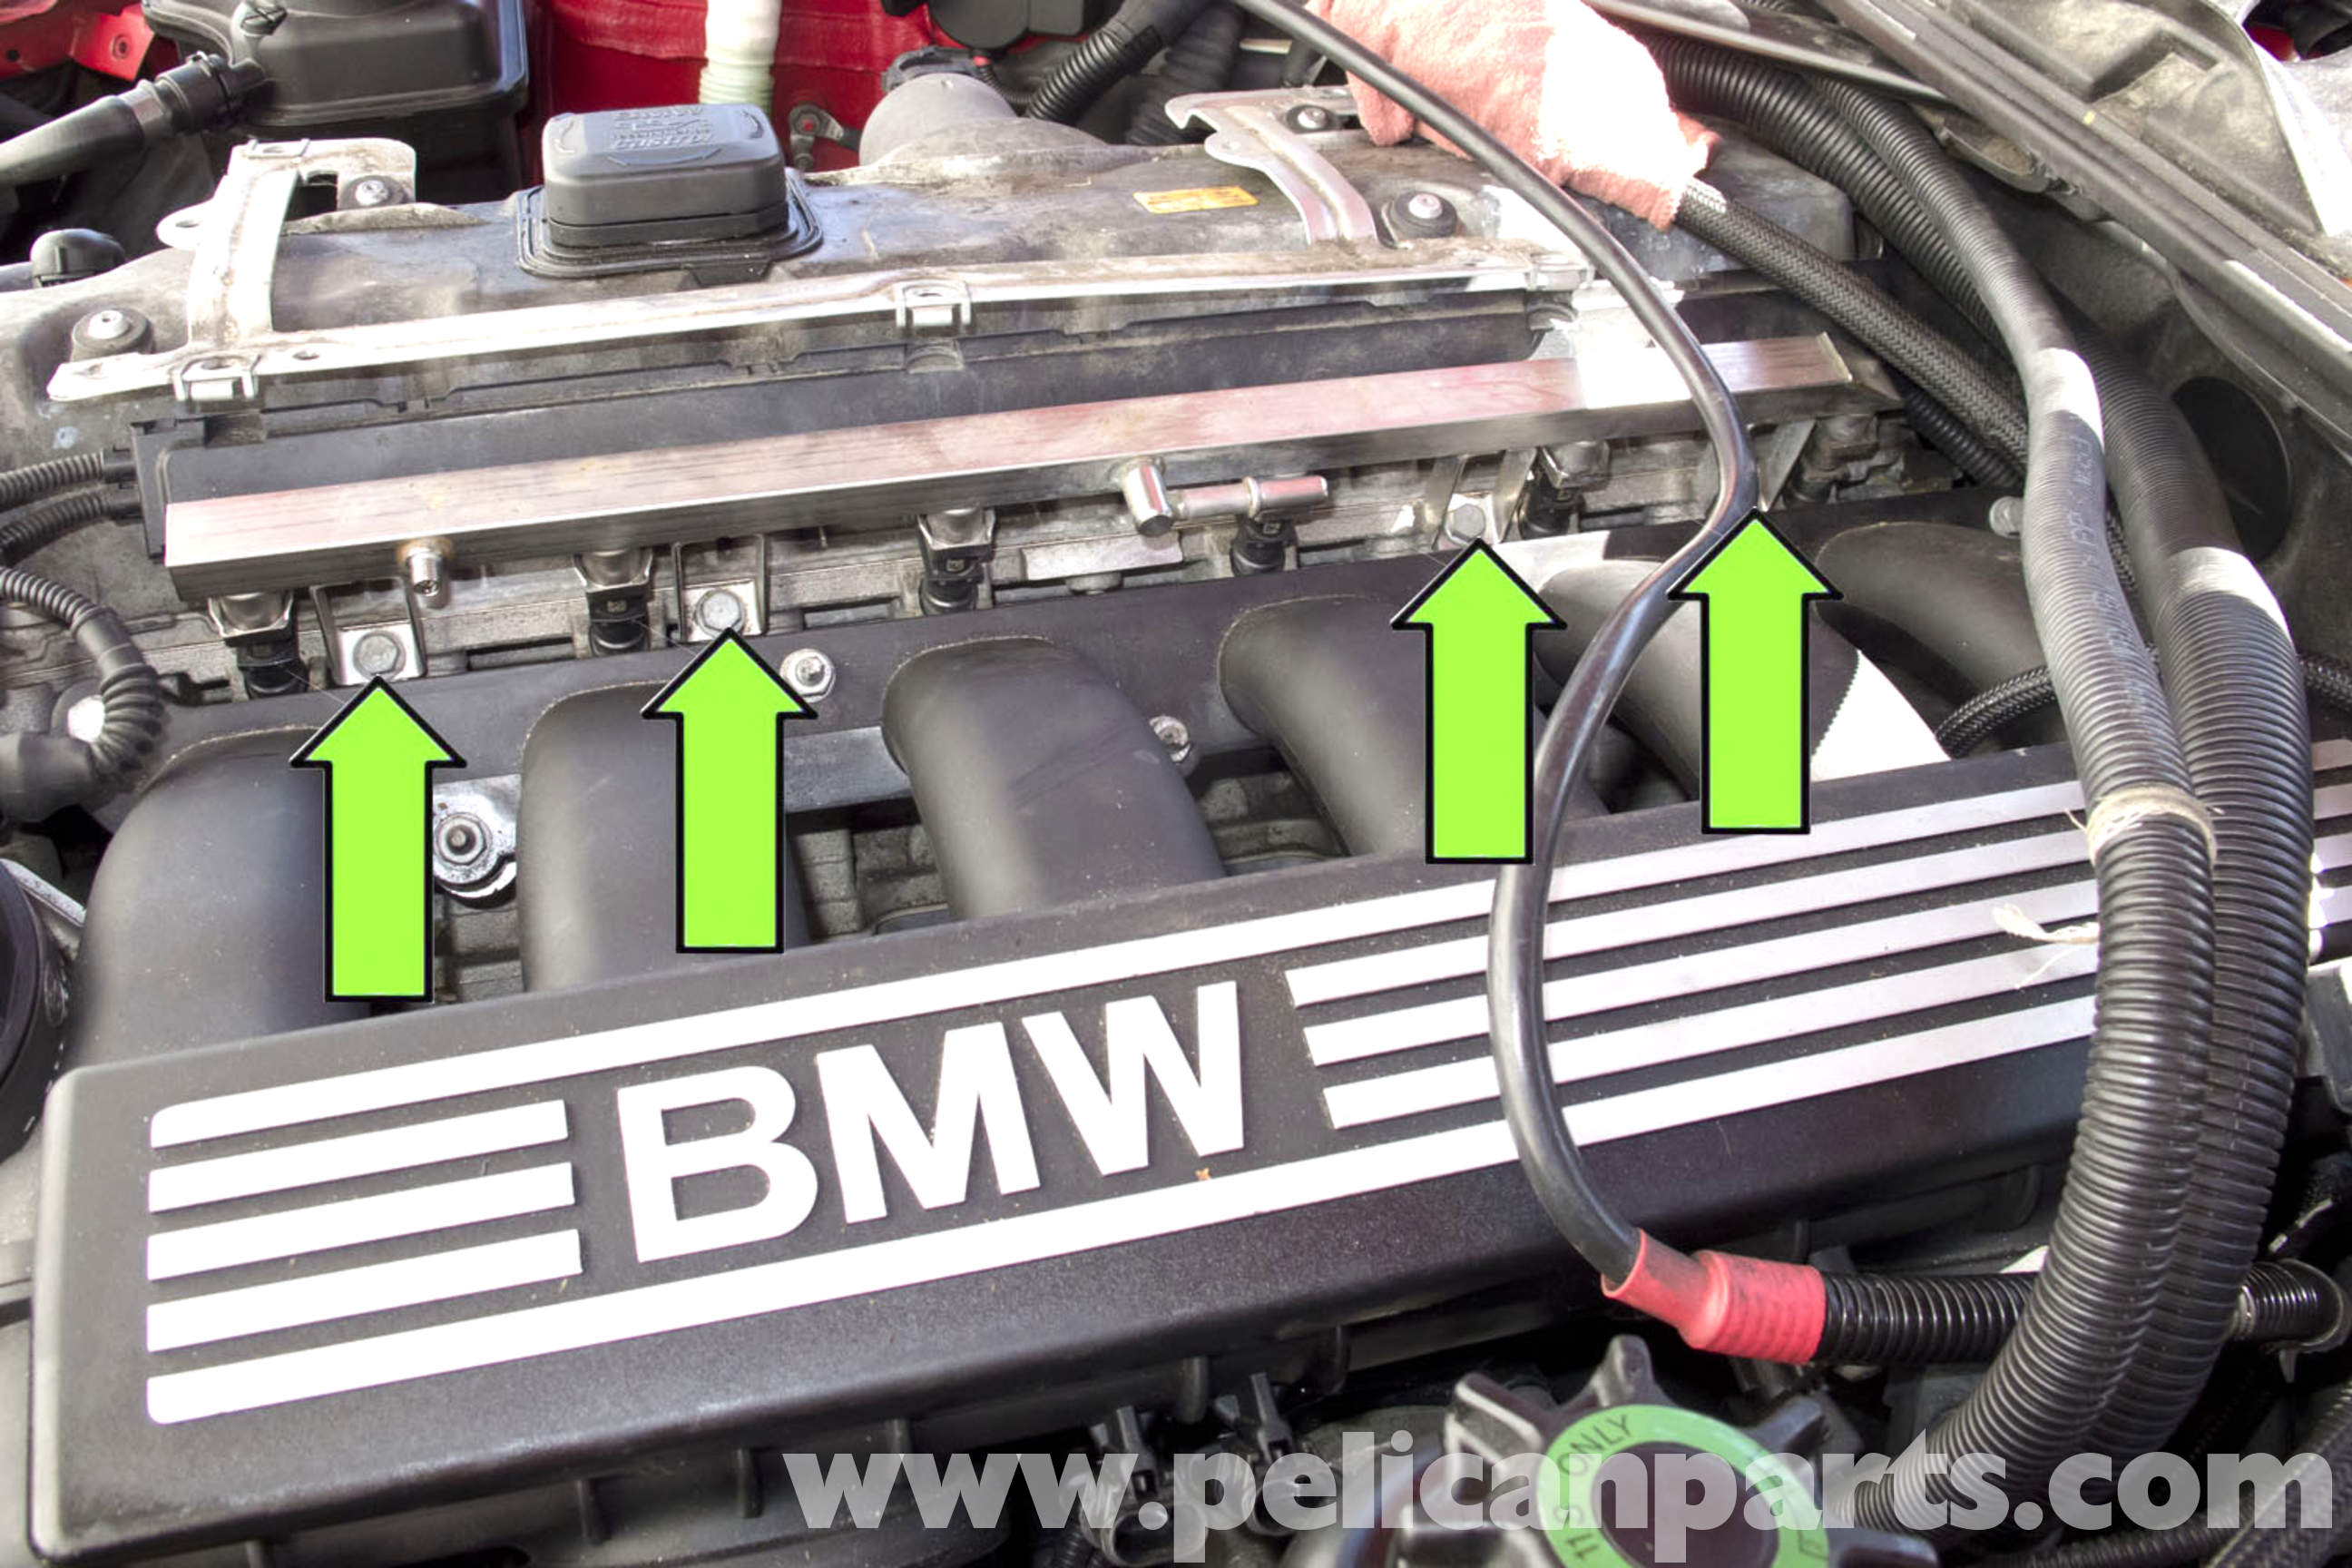 What Are Fuel Injectors Wiring Diagrams Square D Schneider Electric Qob130 Miniature Circuit Breaker 24 Bmw E90 Injector Replacement E91 E92 E93 Pelican Parts Rh Pelicanparts Com